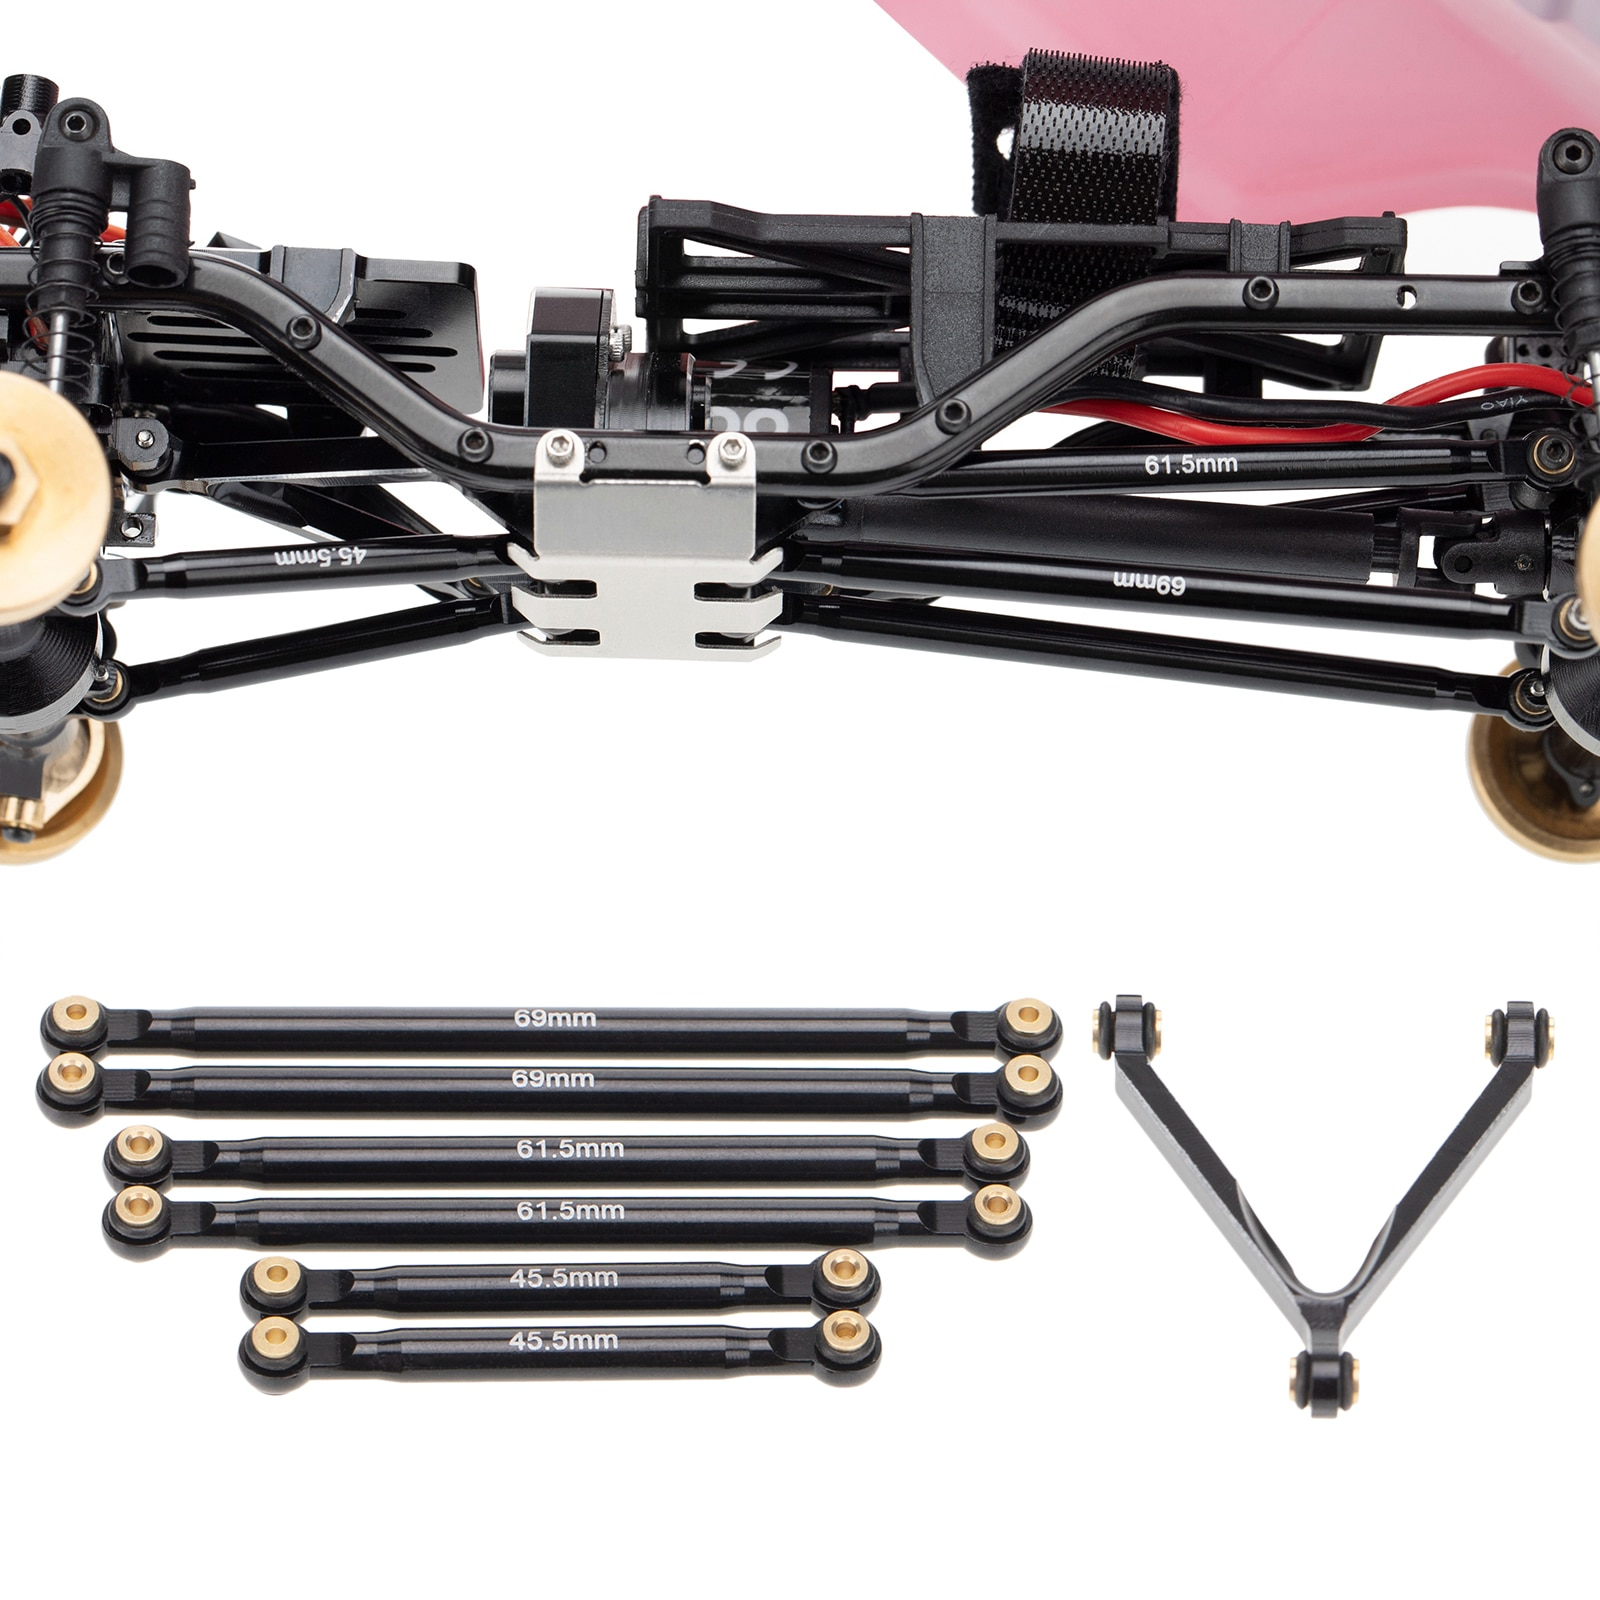 7pcs RC Aluminum Alloy Link Set 133mm Wheelbase for Axial SCX24 AXI00002, Model Crawler Buggy Car Upgrade Parts enlarge